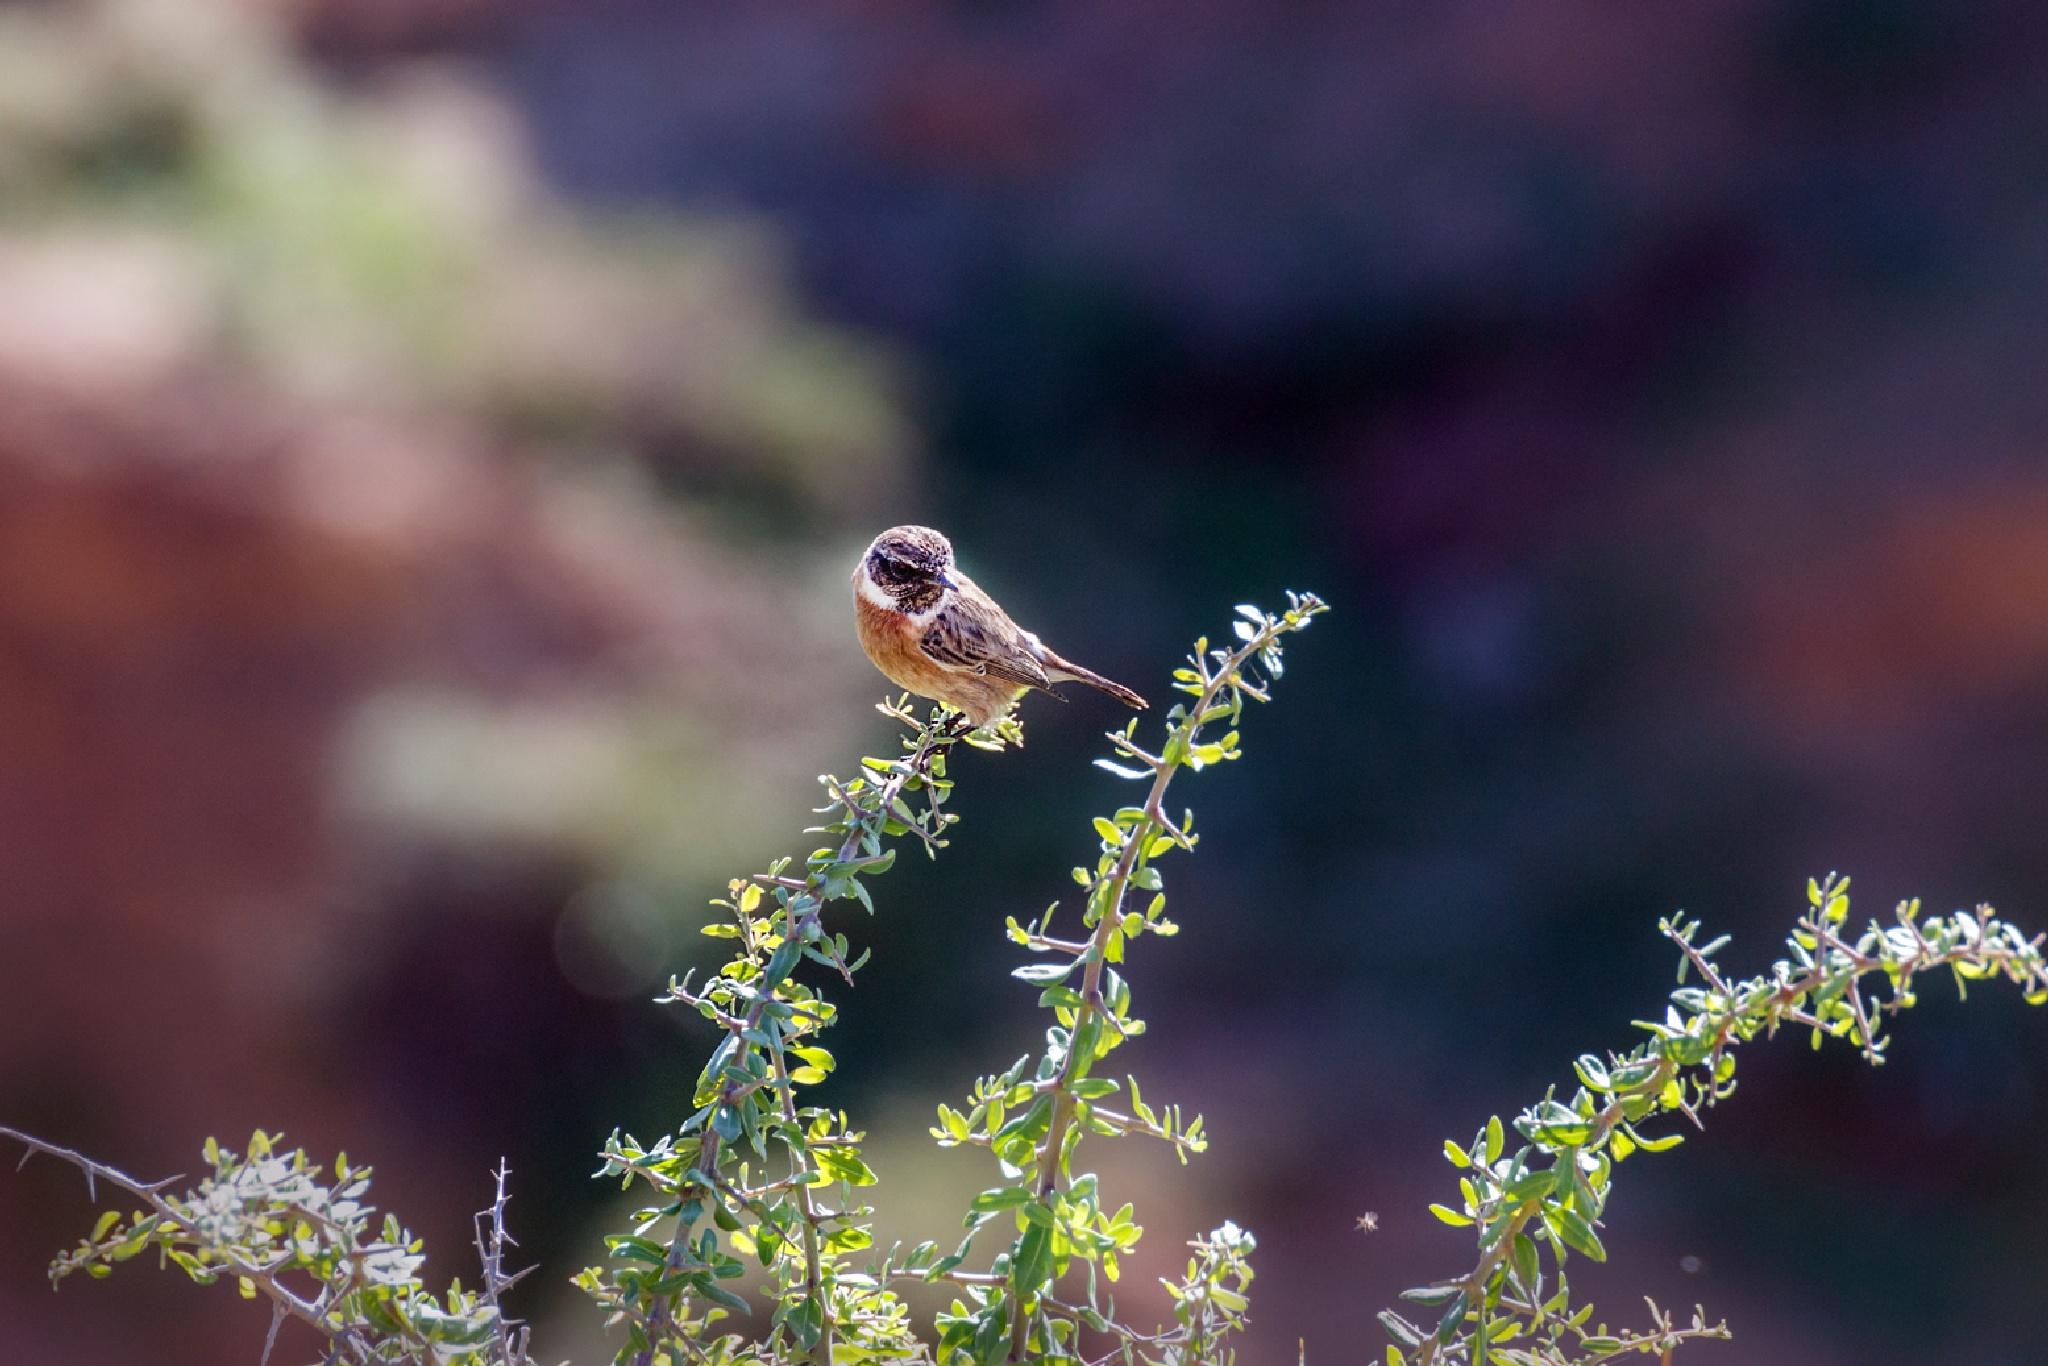 A little bird by Anatoly Vinokurov